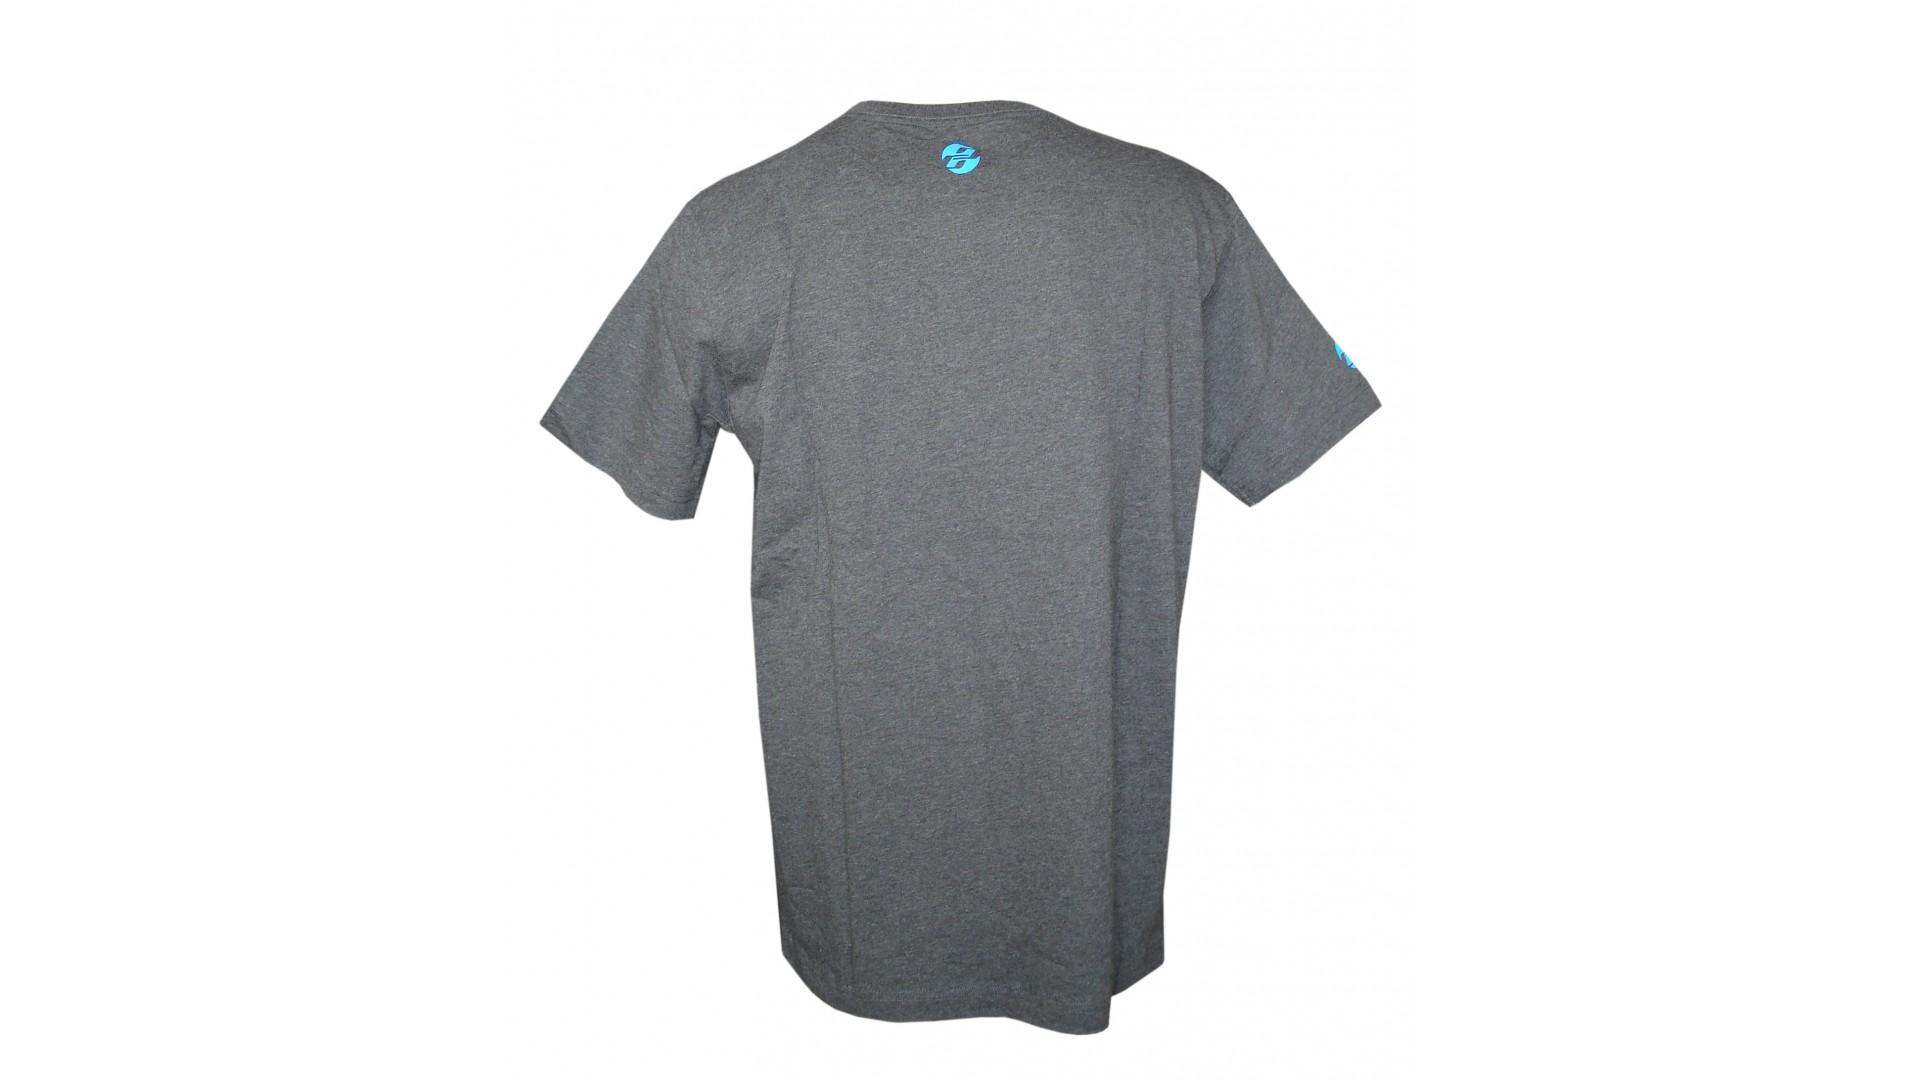 Футболка Ghost T-shirt AMR grey год 2016 вид сзади